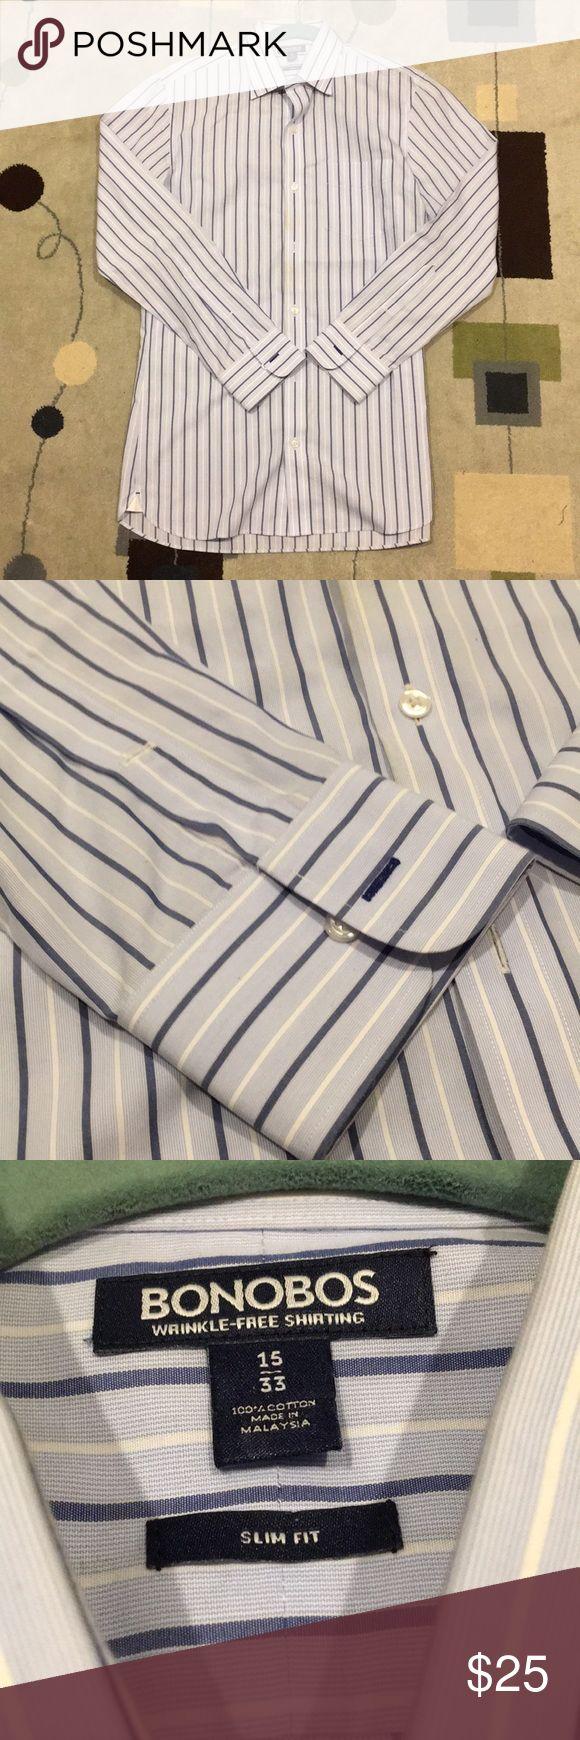 Bonobos Striped dress shirt. Slim fit. Iron-free Bonobos makes the best dress shirts ever for slim guys like me. Not to mention it's wrinkle-free 100% cotton! Sizing: Neck: 15 Sleeve: 33 Bonobos Shirts Dress Shirts